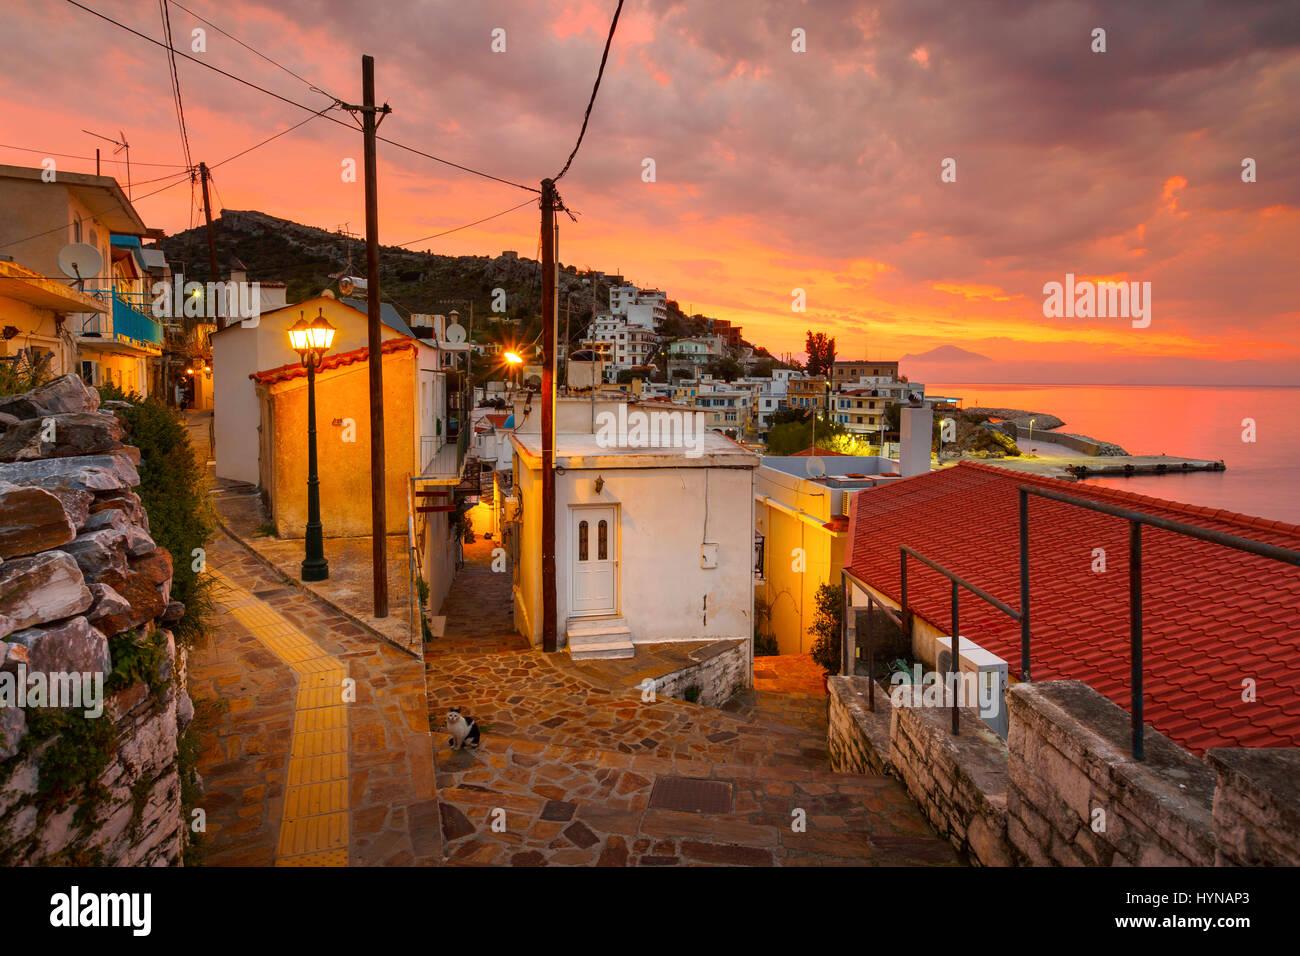 Agios Kirikos village on Ikaria island in Greece. - Stock Image